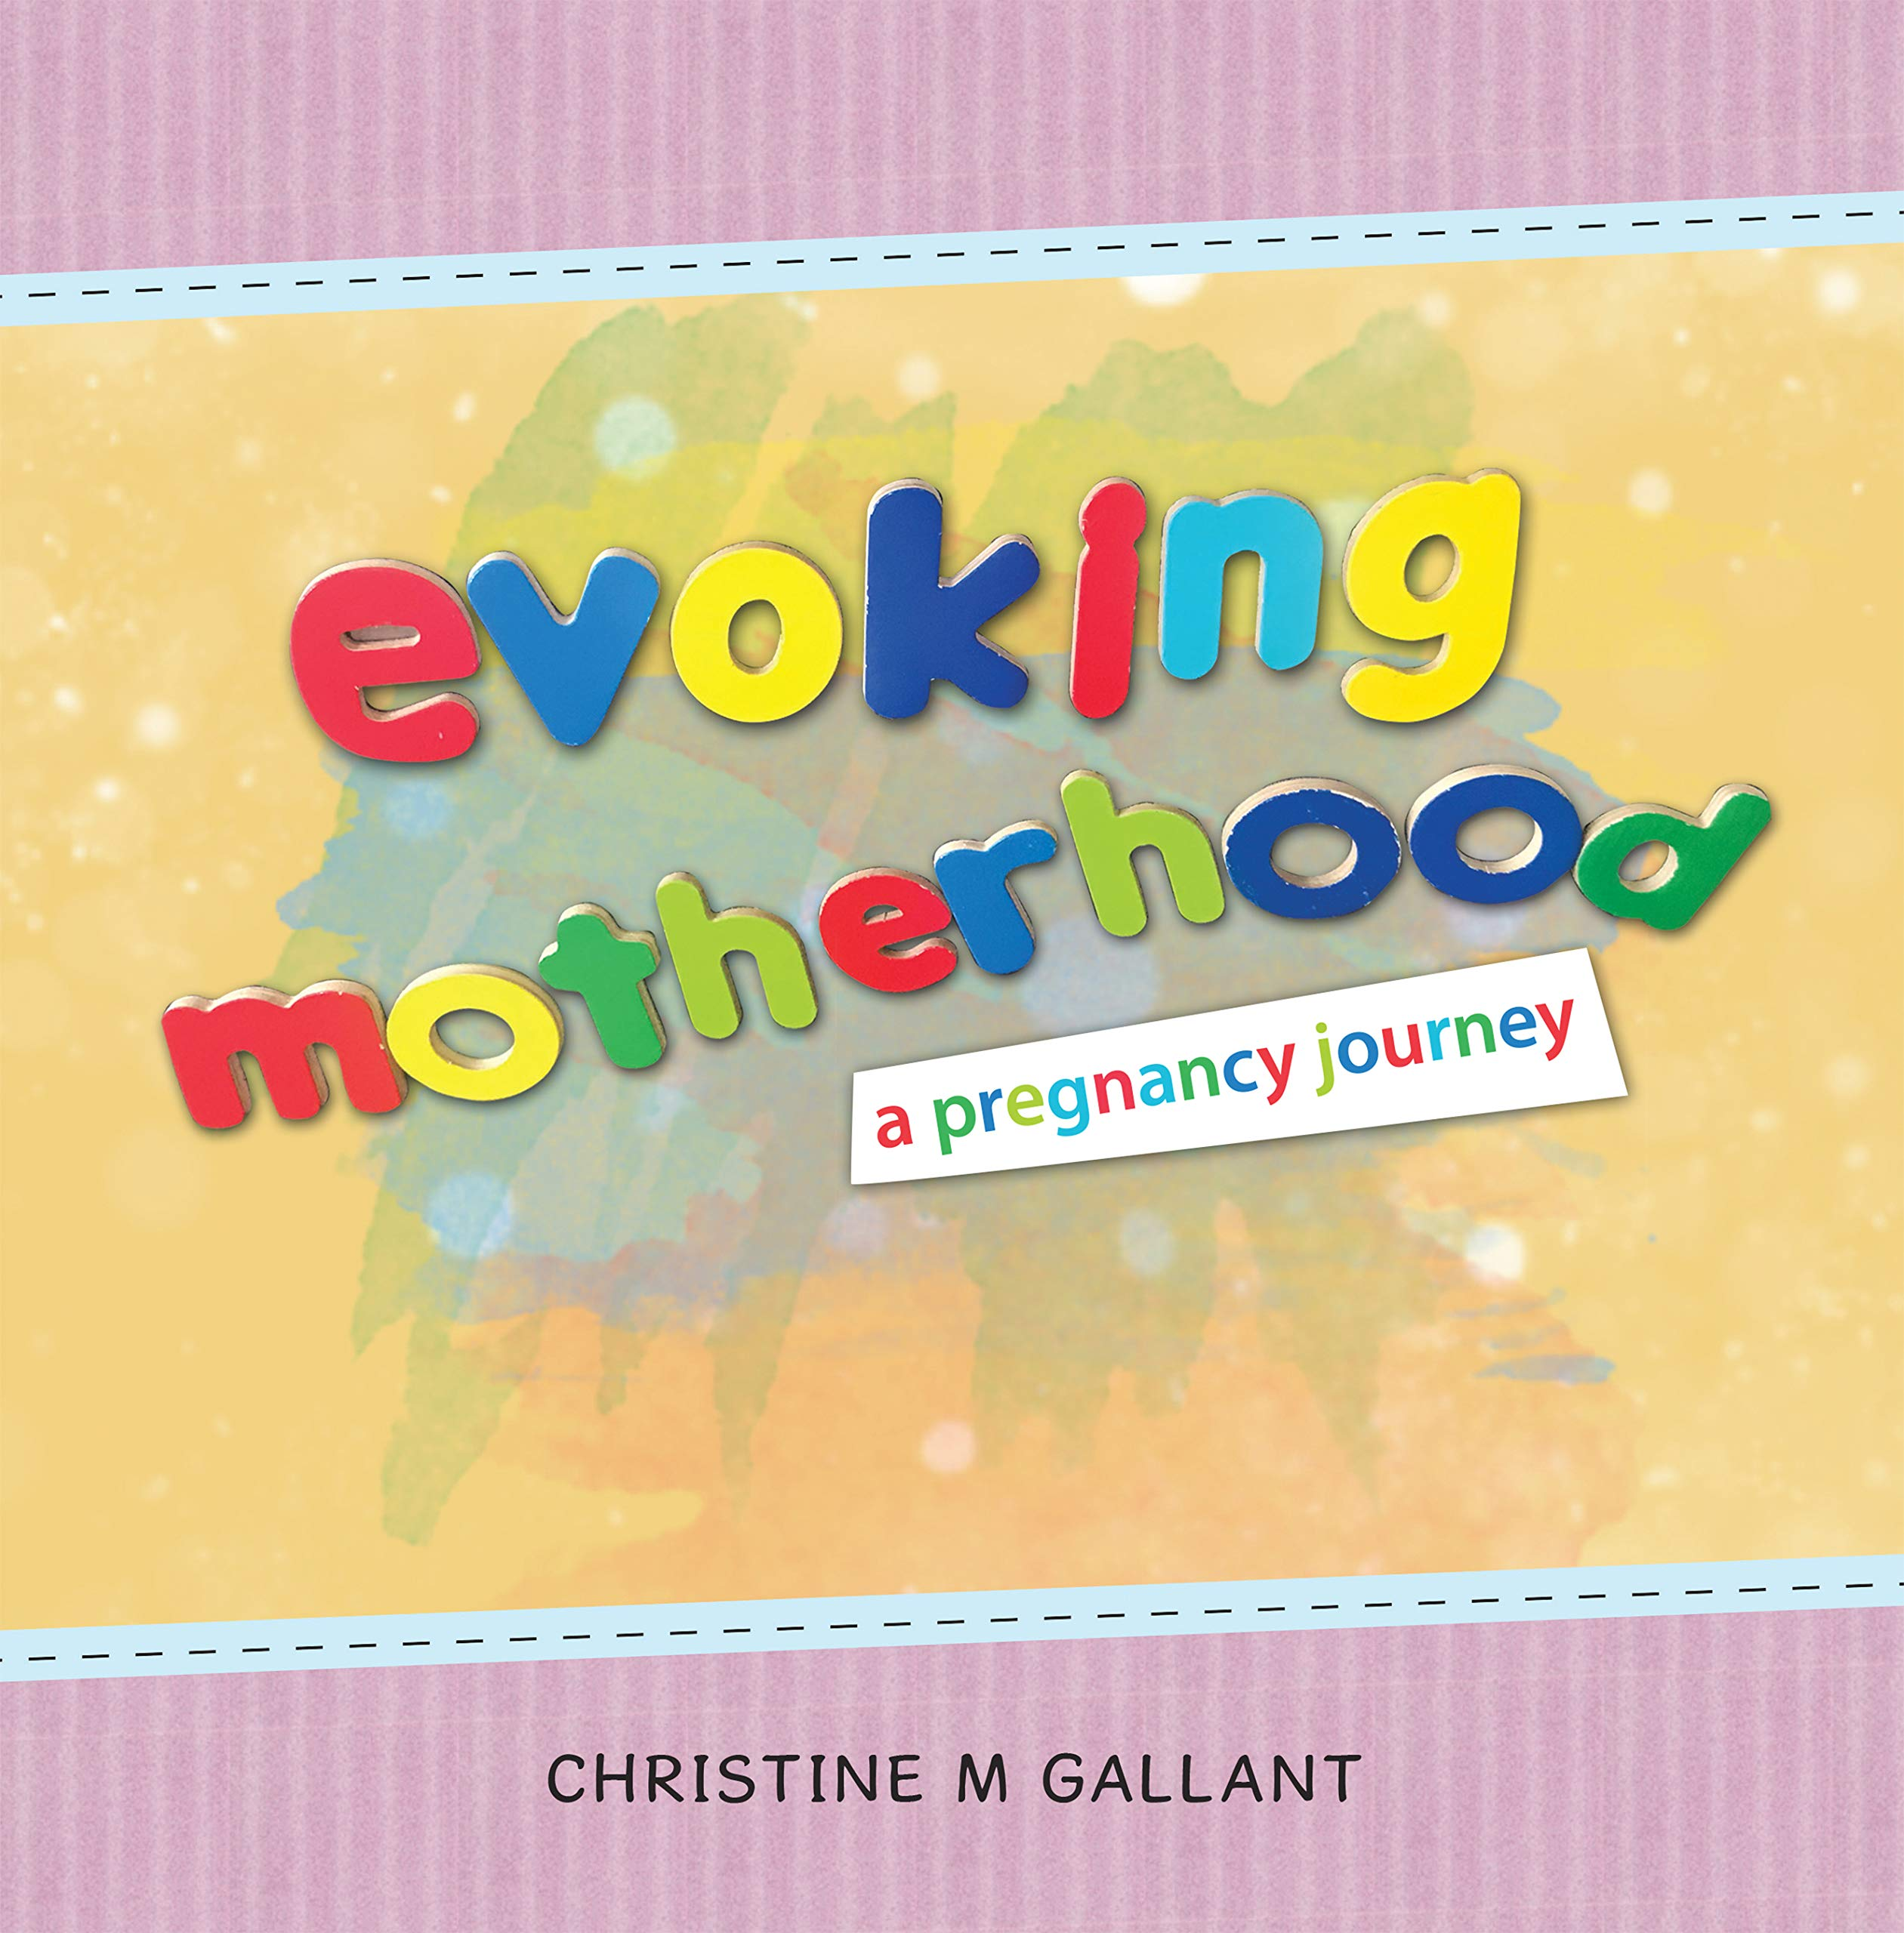 Evoking Motherhood: A Pregnancy Journey